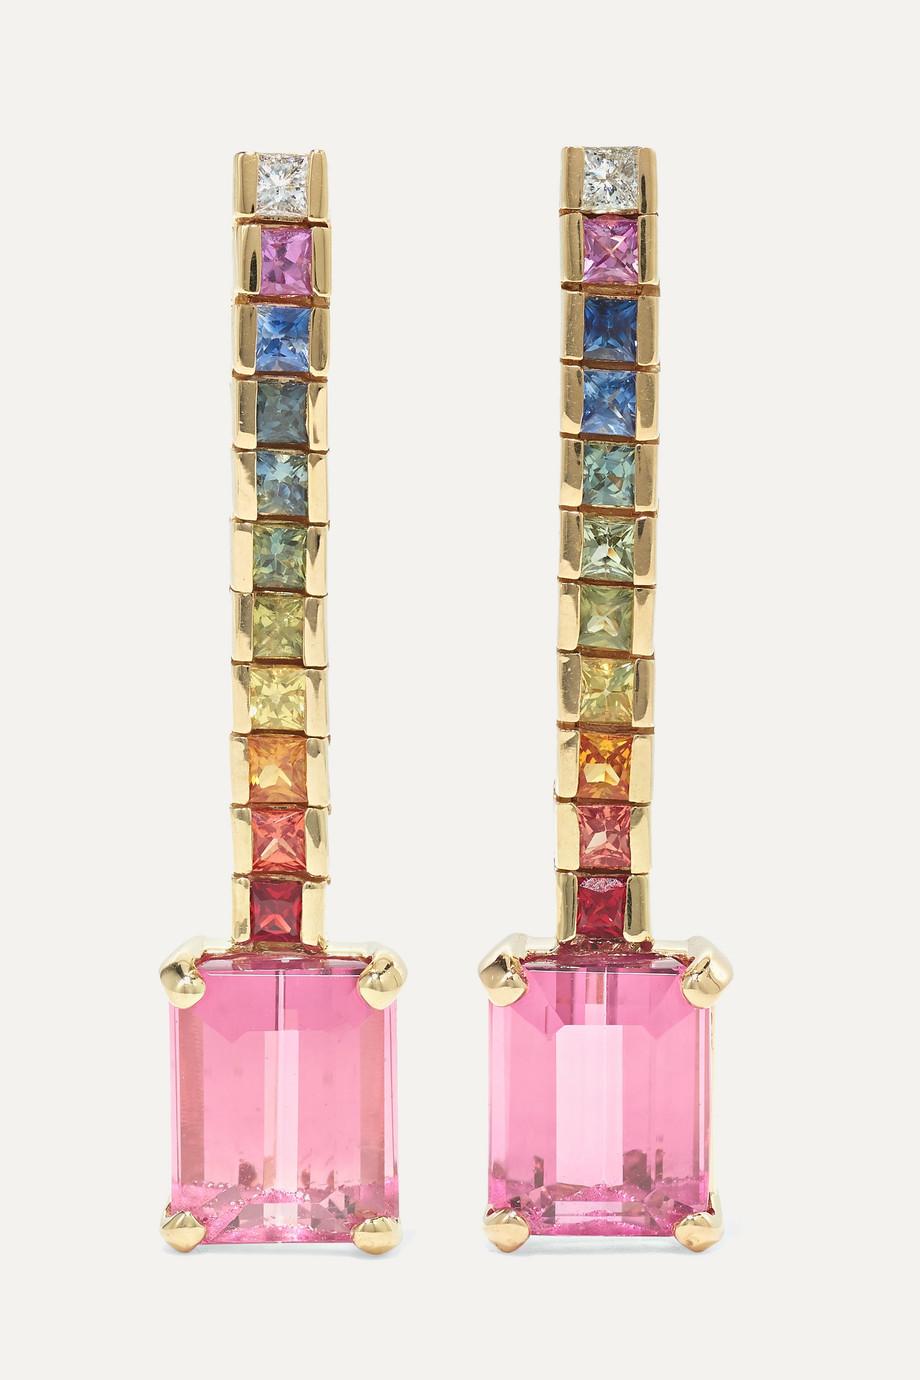 Mateo Somewhere Over the Rainbow 14-karat gold tourmaline and sapphire earrings